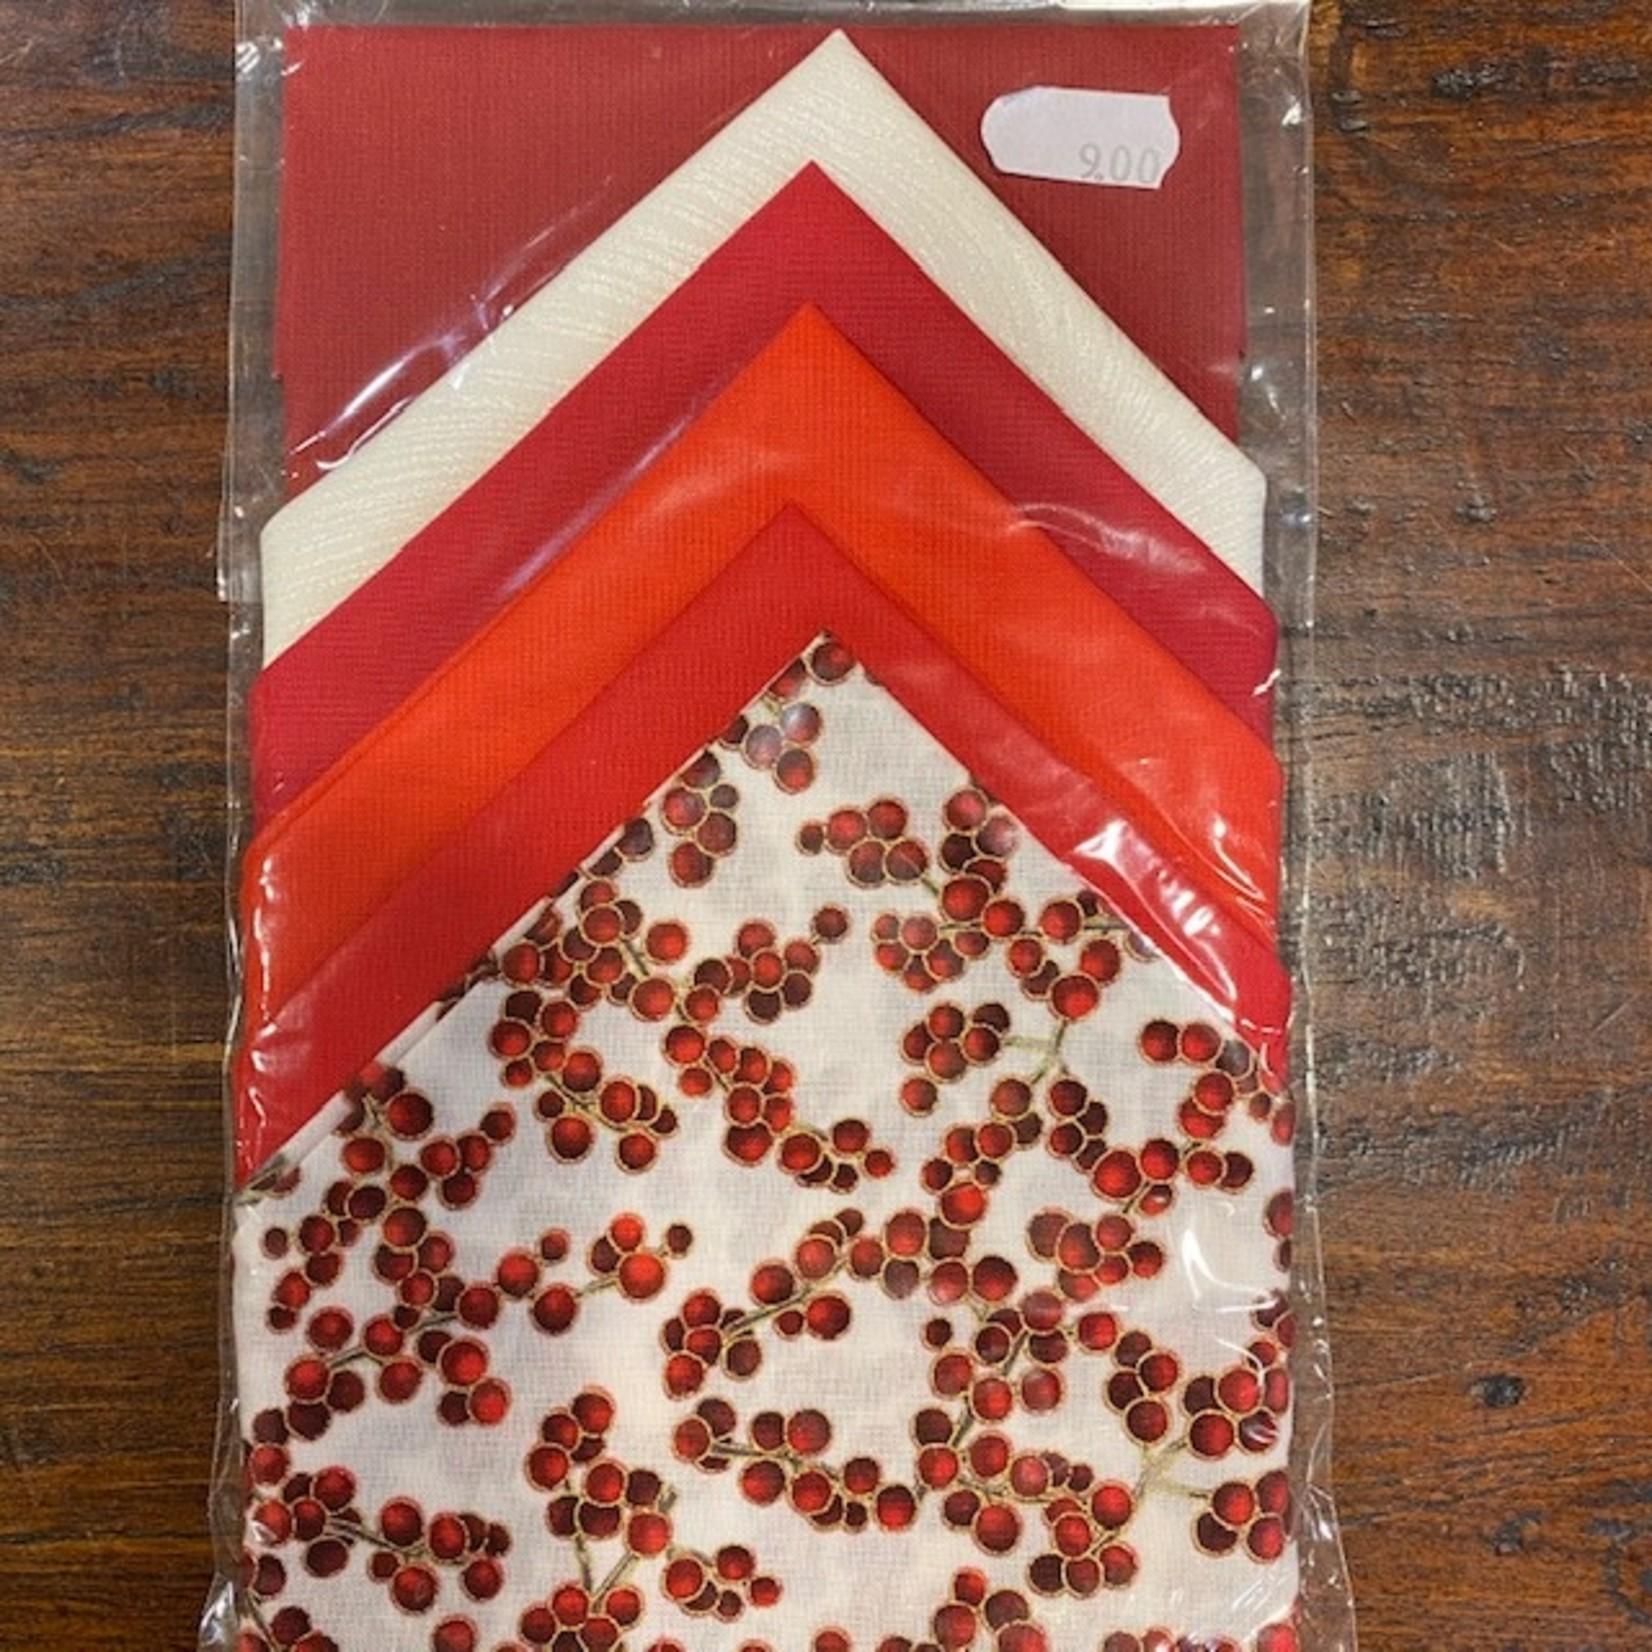 Elly Prins Machine Quilting Elly's Mini's - 32 - Layer Cake - 6 Vierkanten